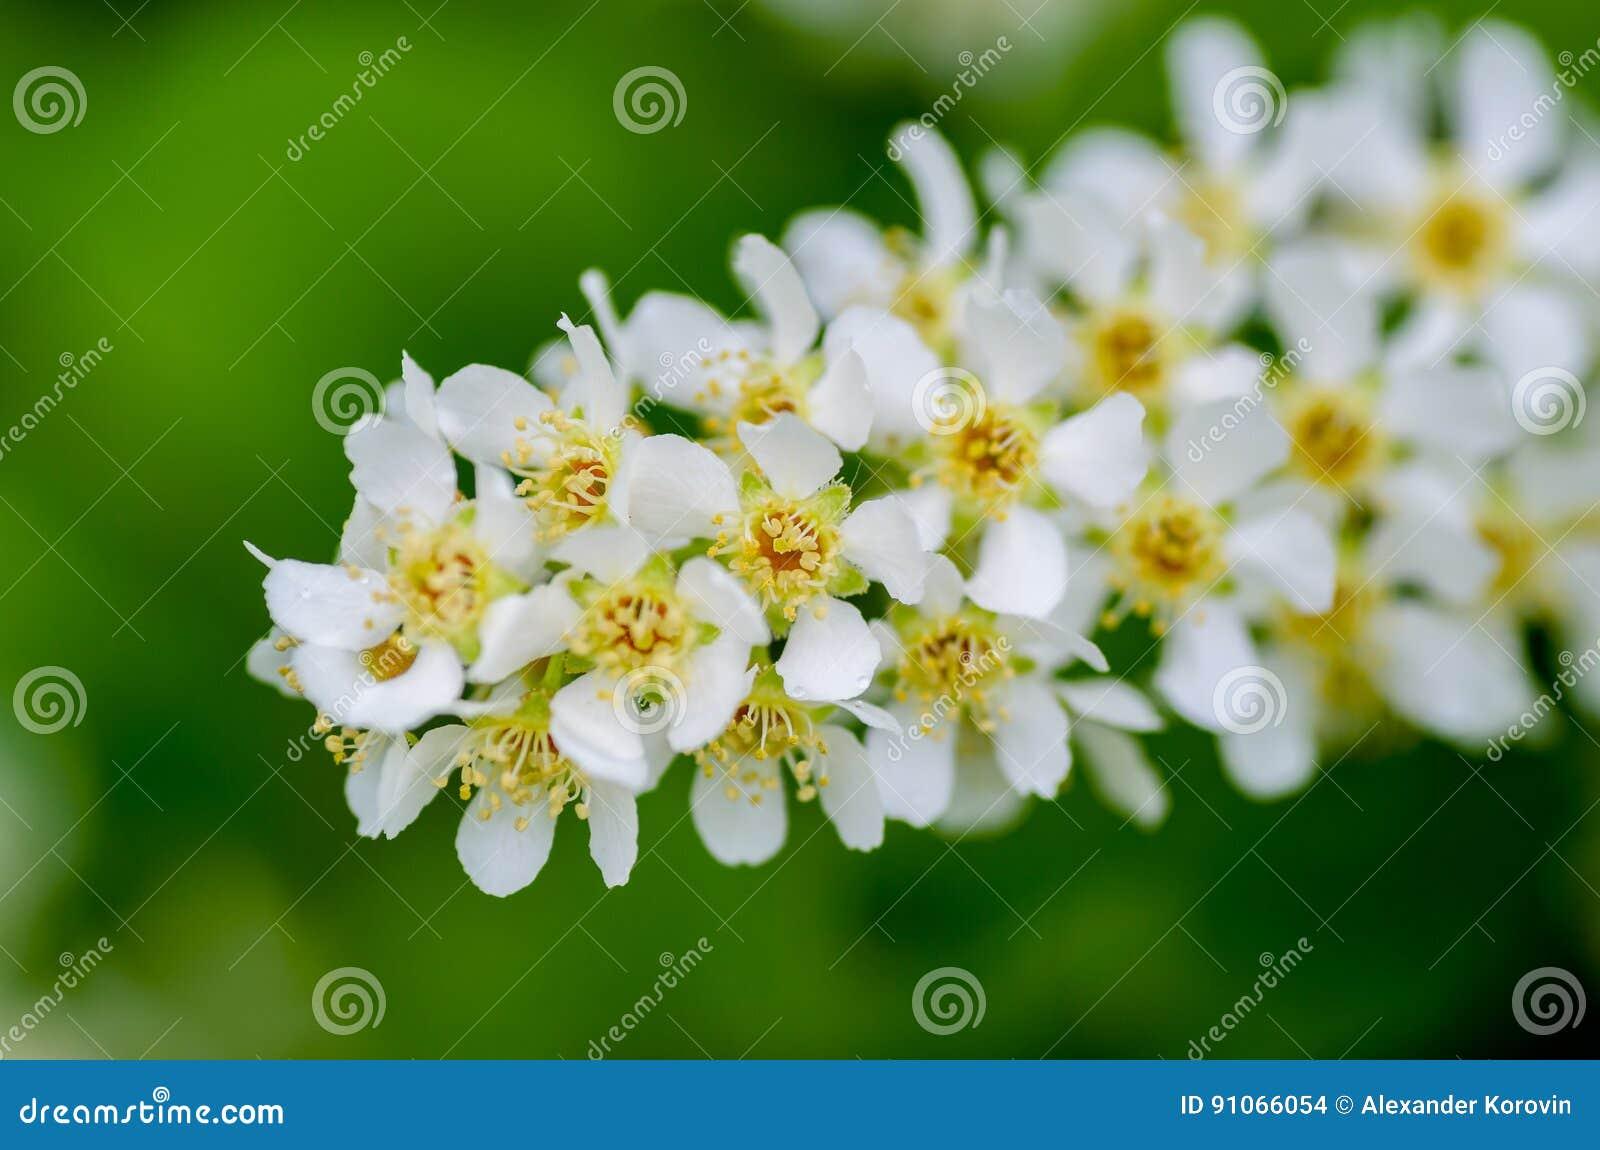 White Fragrant Flowers Of The Bird Cherry Tree Stock Photo Image